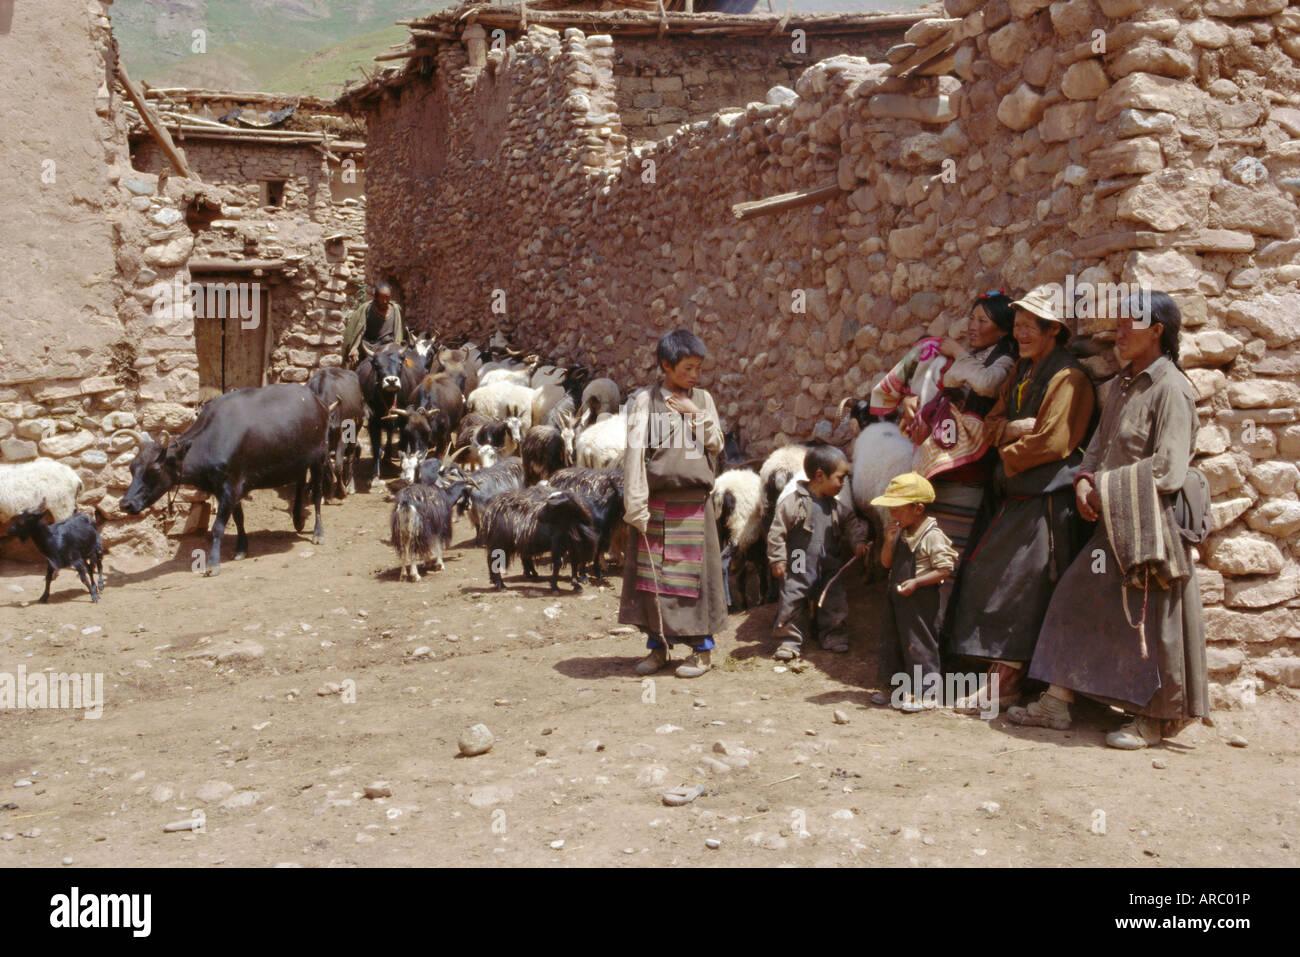 Village scene with Tibetans and their animals, Lahuto, Tibet, China, Asia - Stock Image